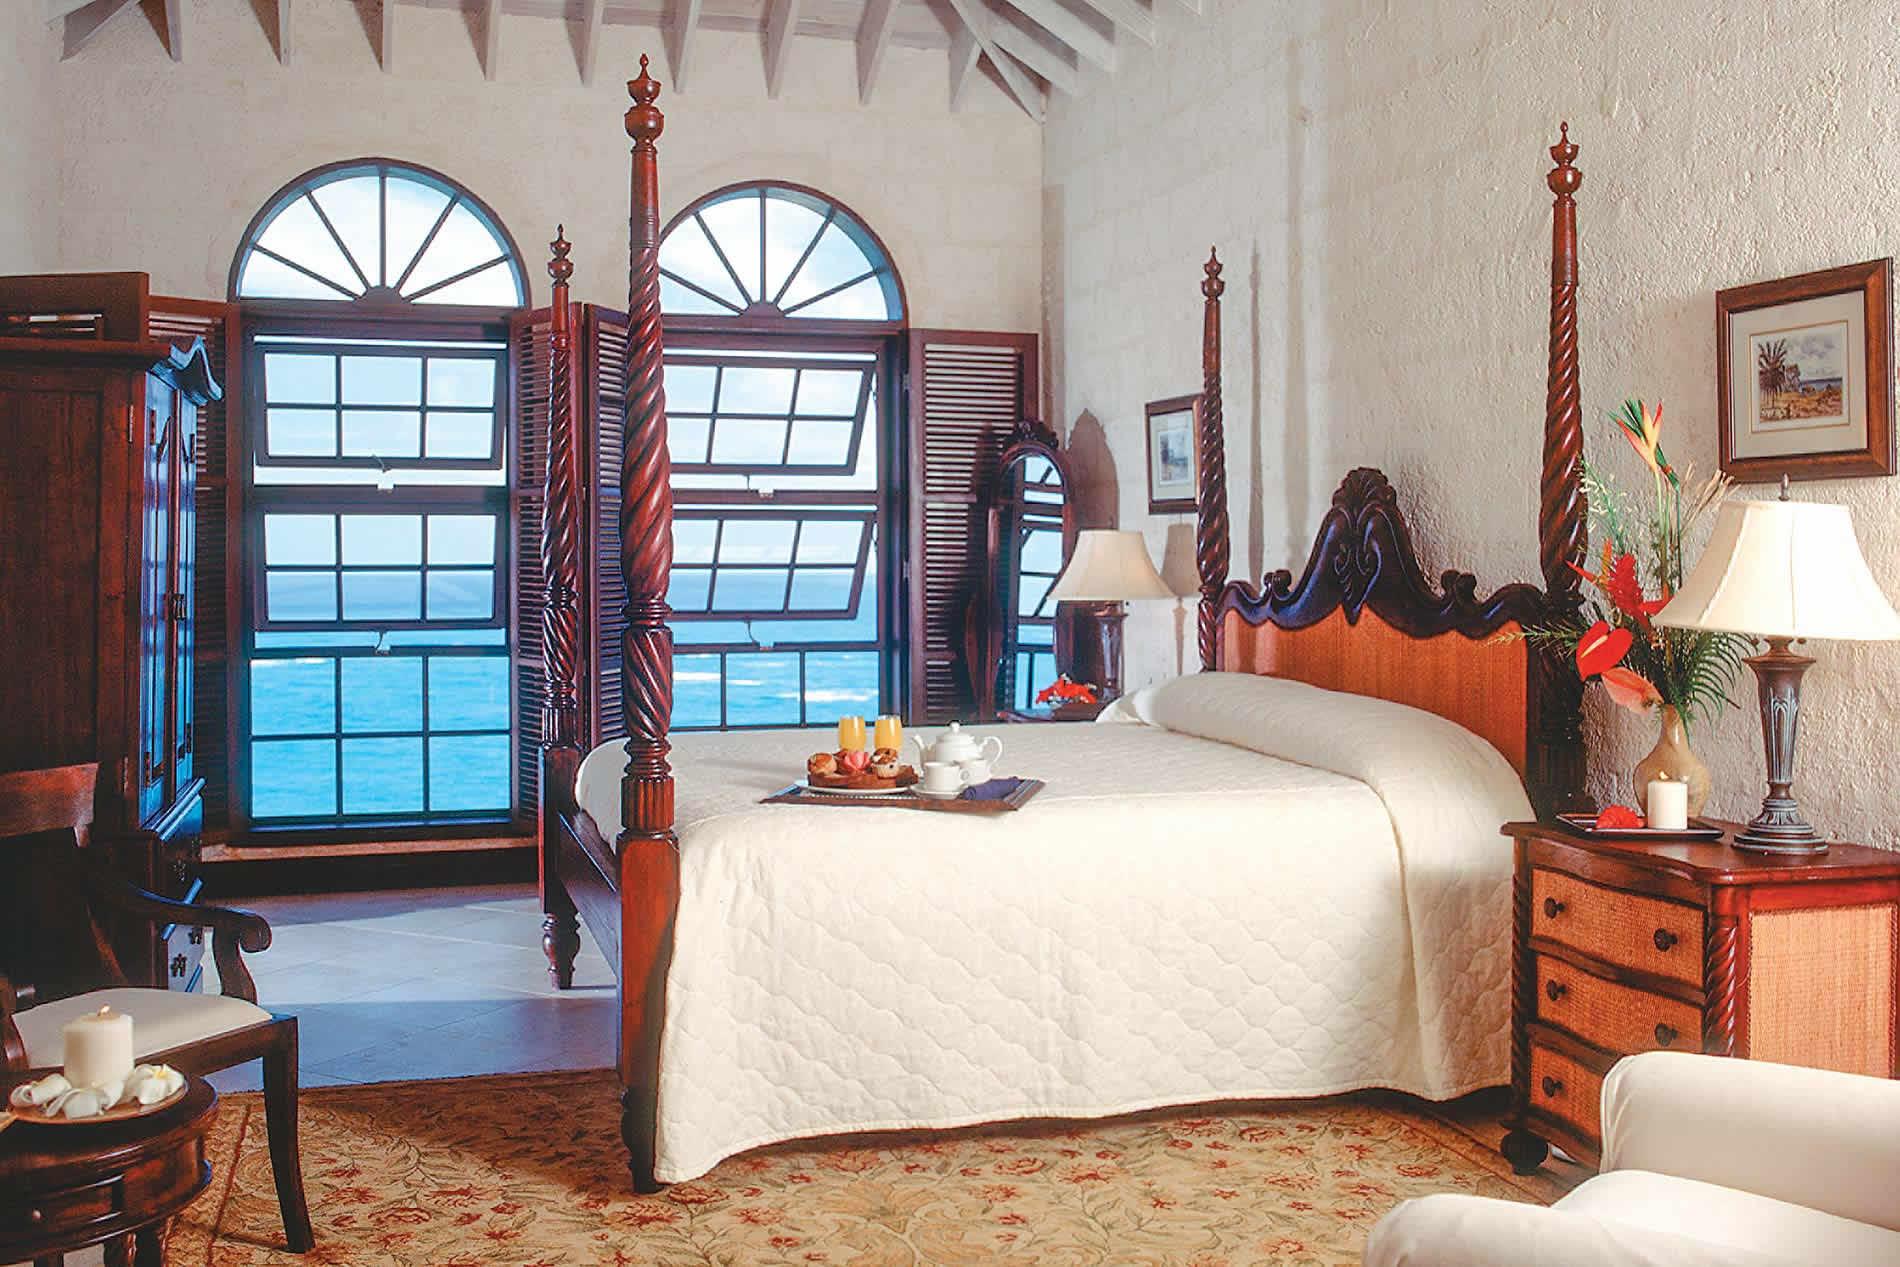 Apartment Ocean View I in The Crane Resort - sleeps 2 people